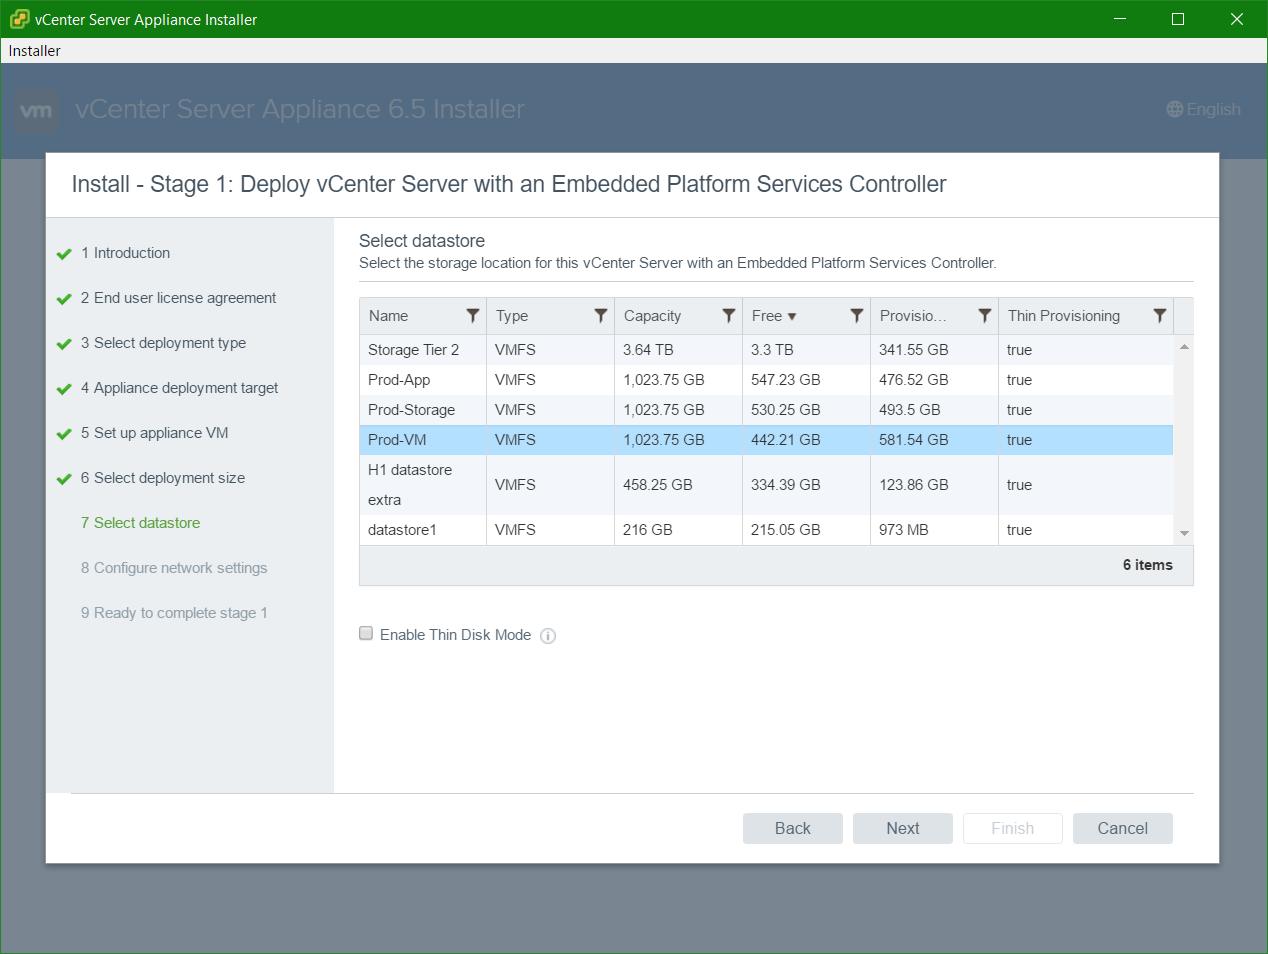 domalab.com VCSA install select datastore